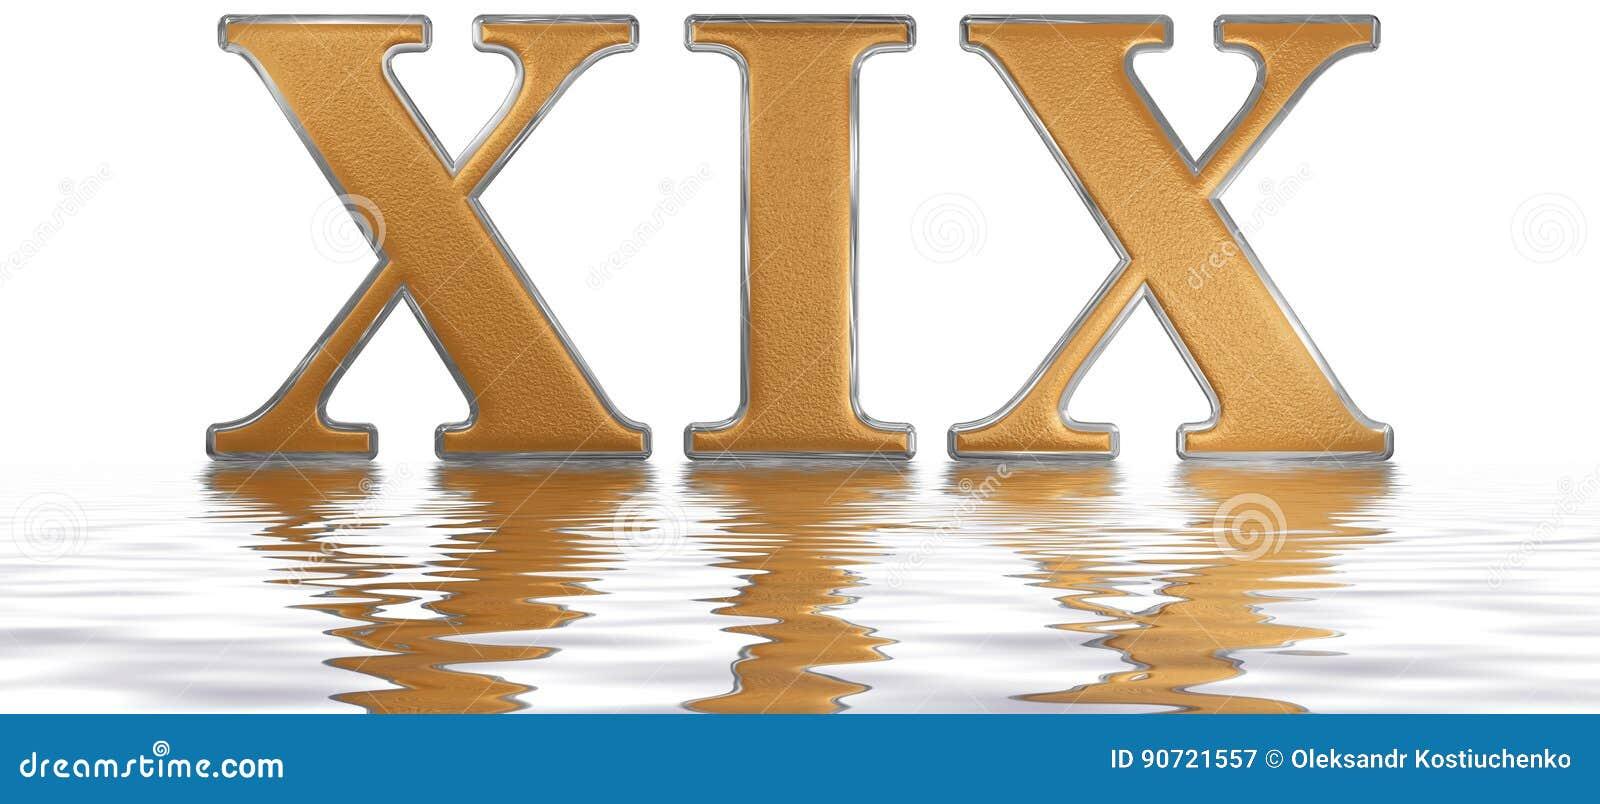 Xxxix Roman Numeral on Flash Cards